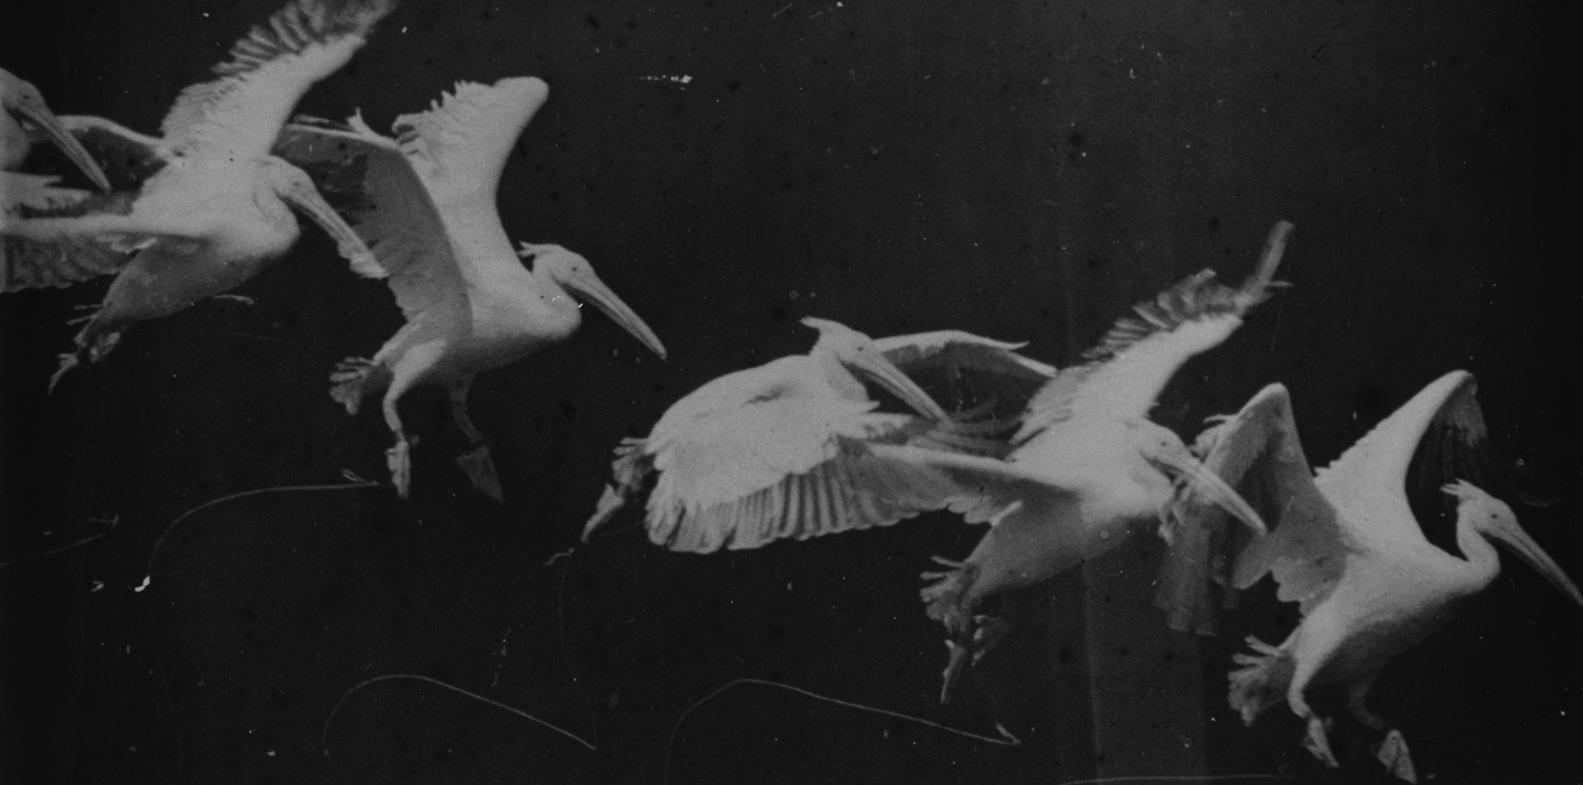 Flying pelican, Marey (a. 1882)